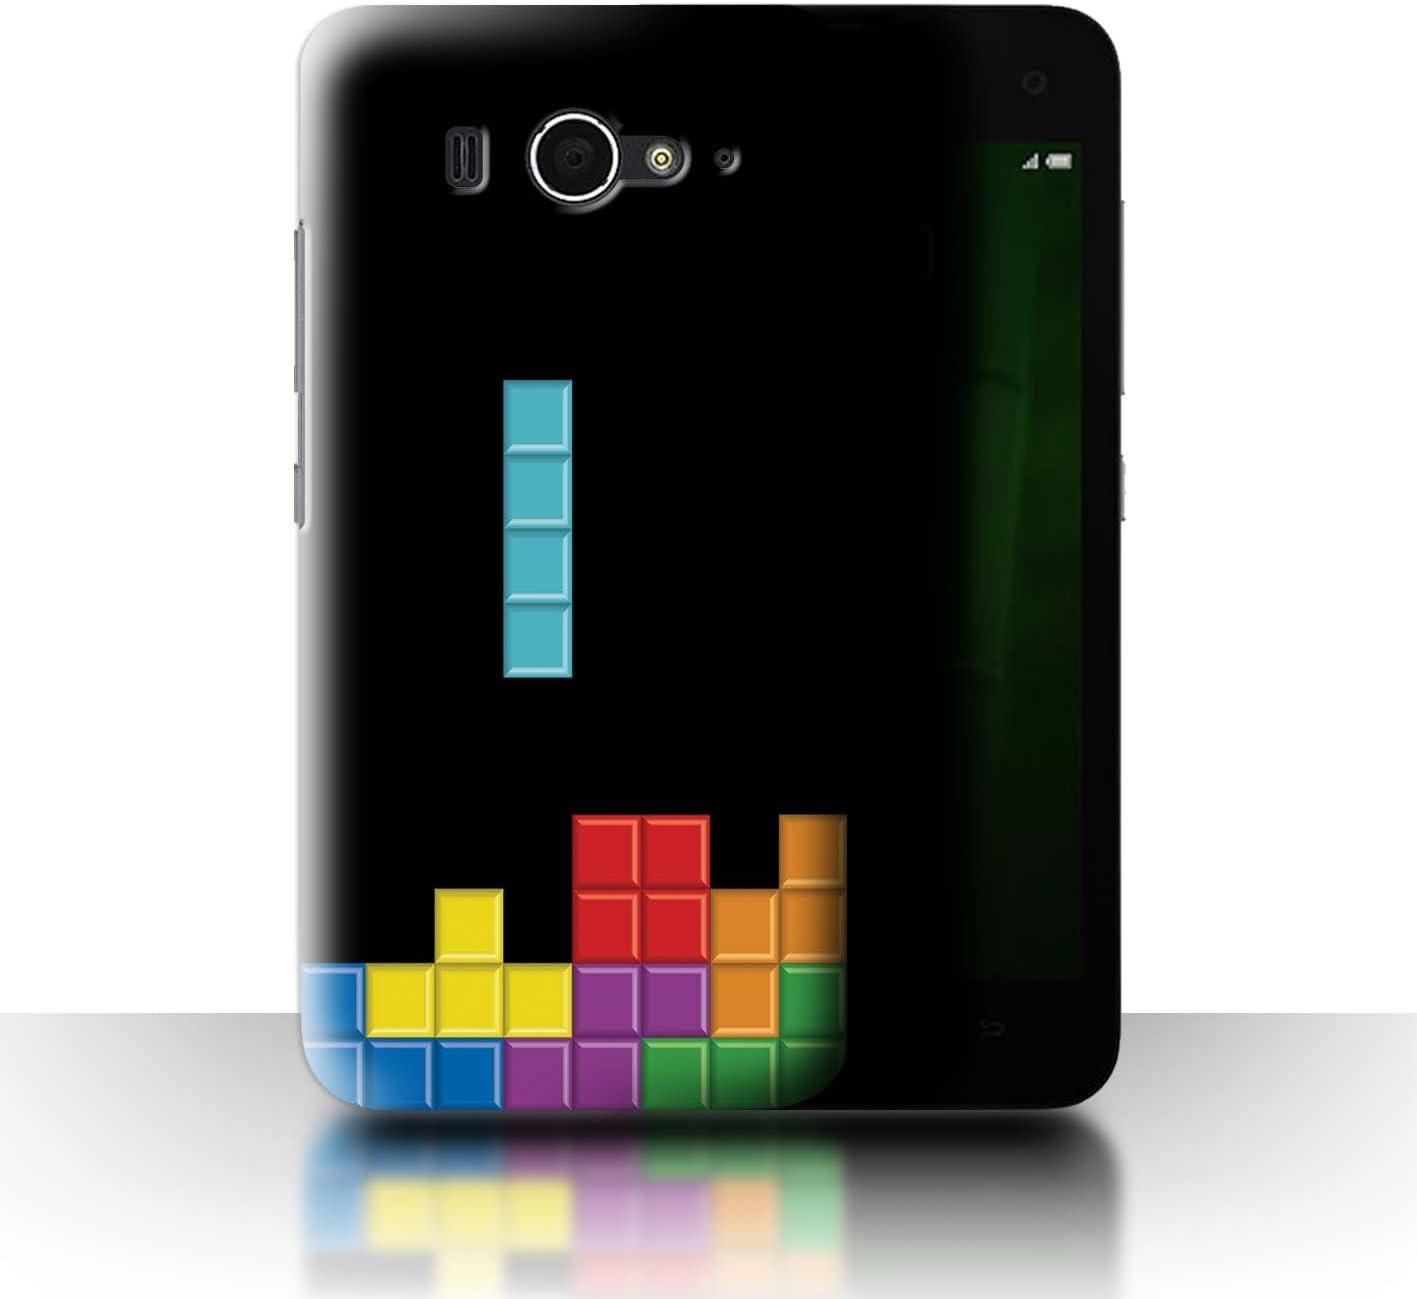 Stuff4® Phone Case/Cover/Skin/Xia de CC/Retro Arcade Games Collection Block-Puzzle Xiaomi Redmi Note 4G: Amazon.es: Informática